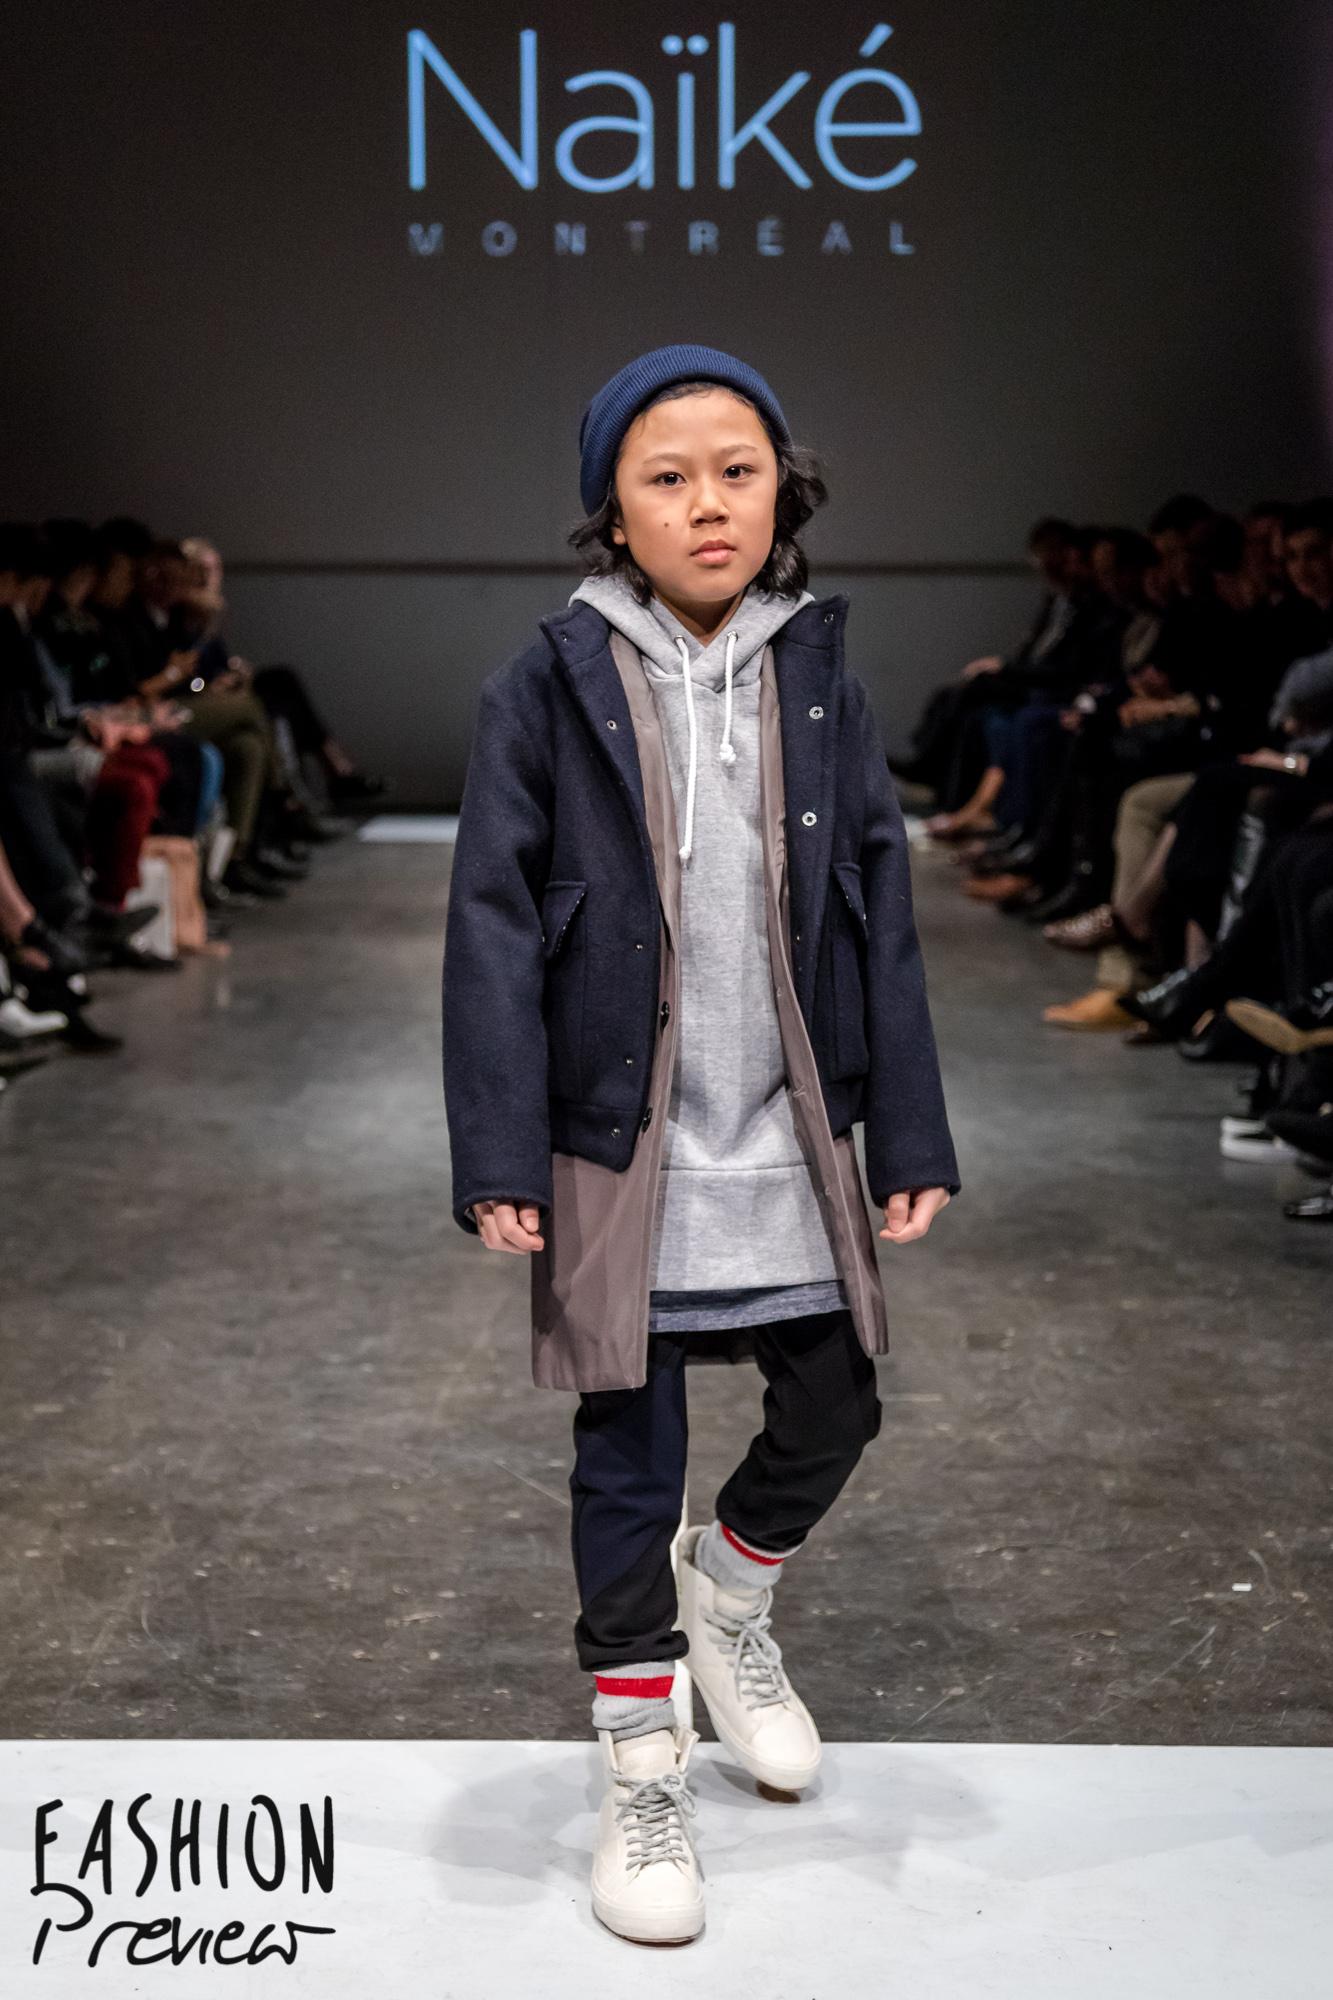 Fashion Preview 9 - Naike-15.jpg